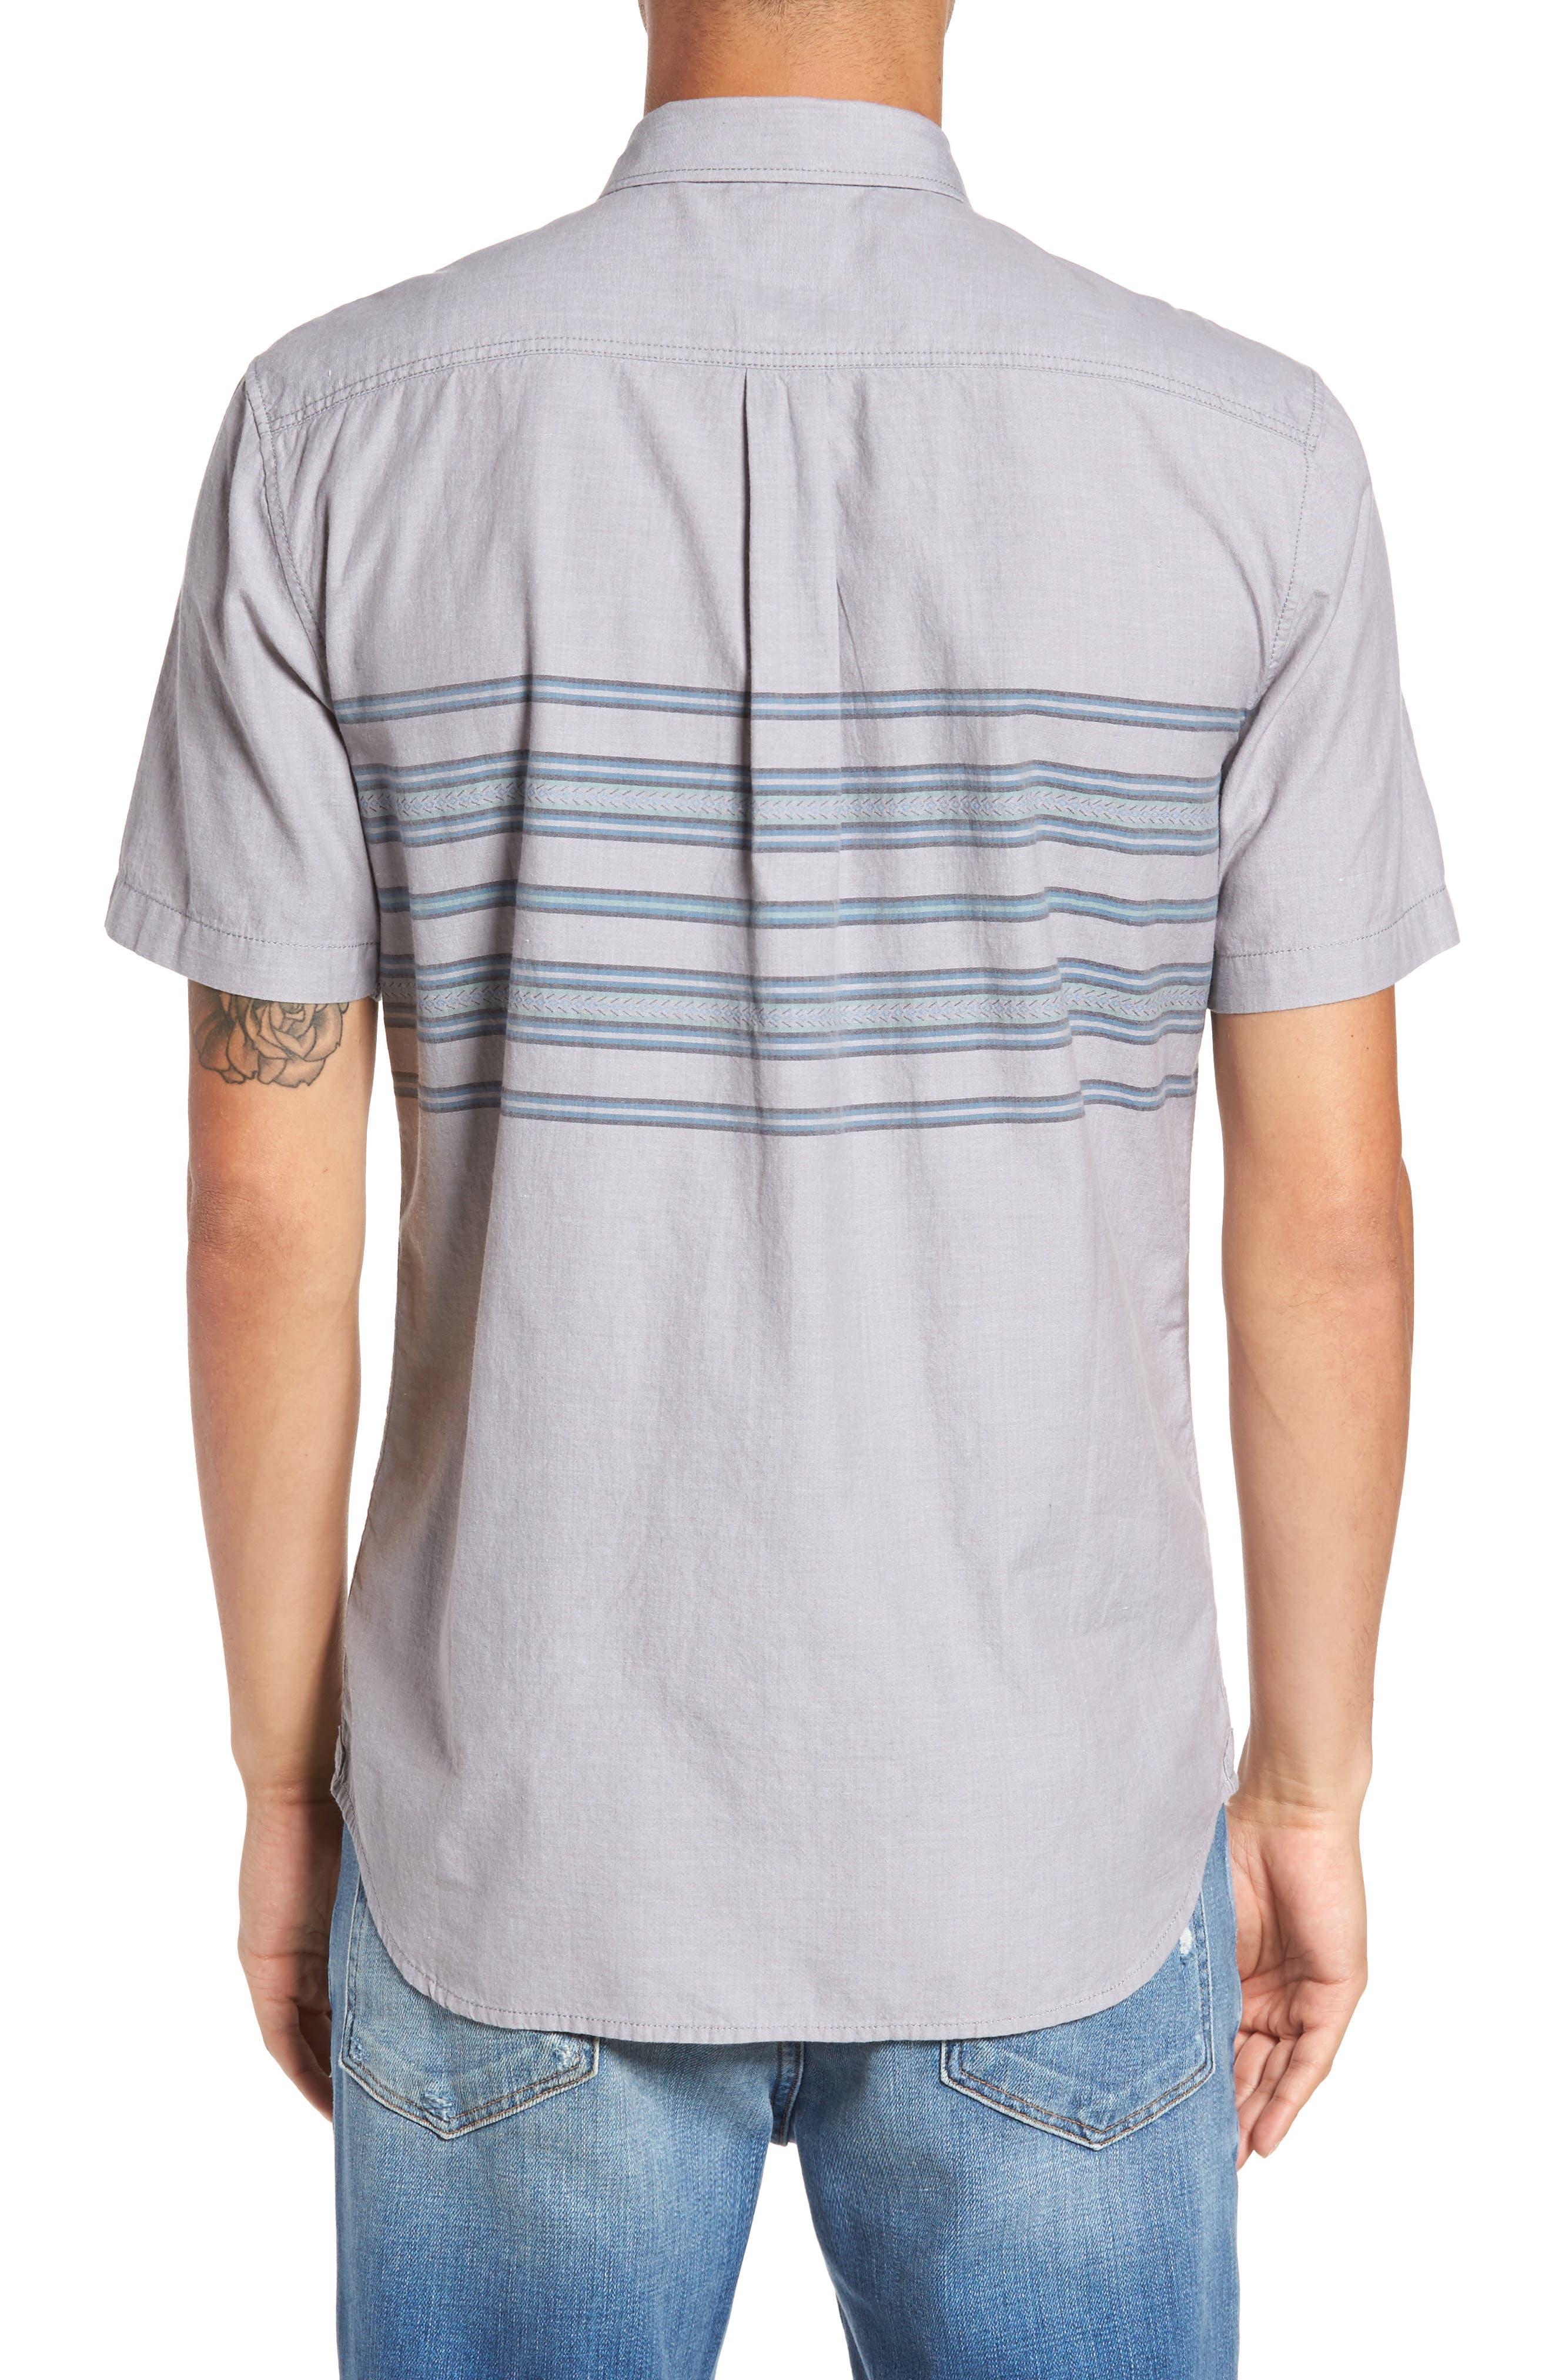 Benmore Striped Woven Shirt,                             Alternate thumbnail 2, color,                             021